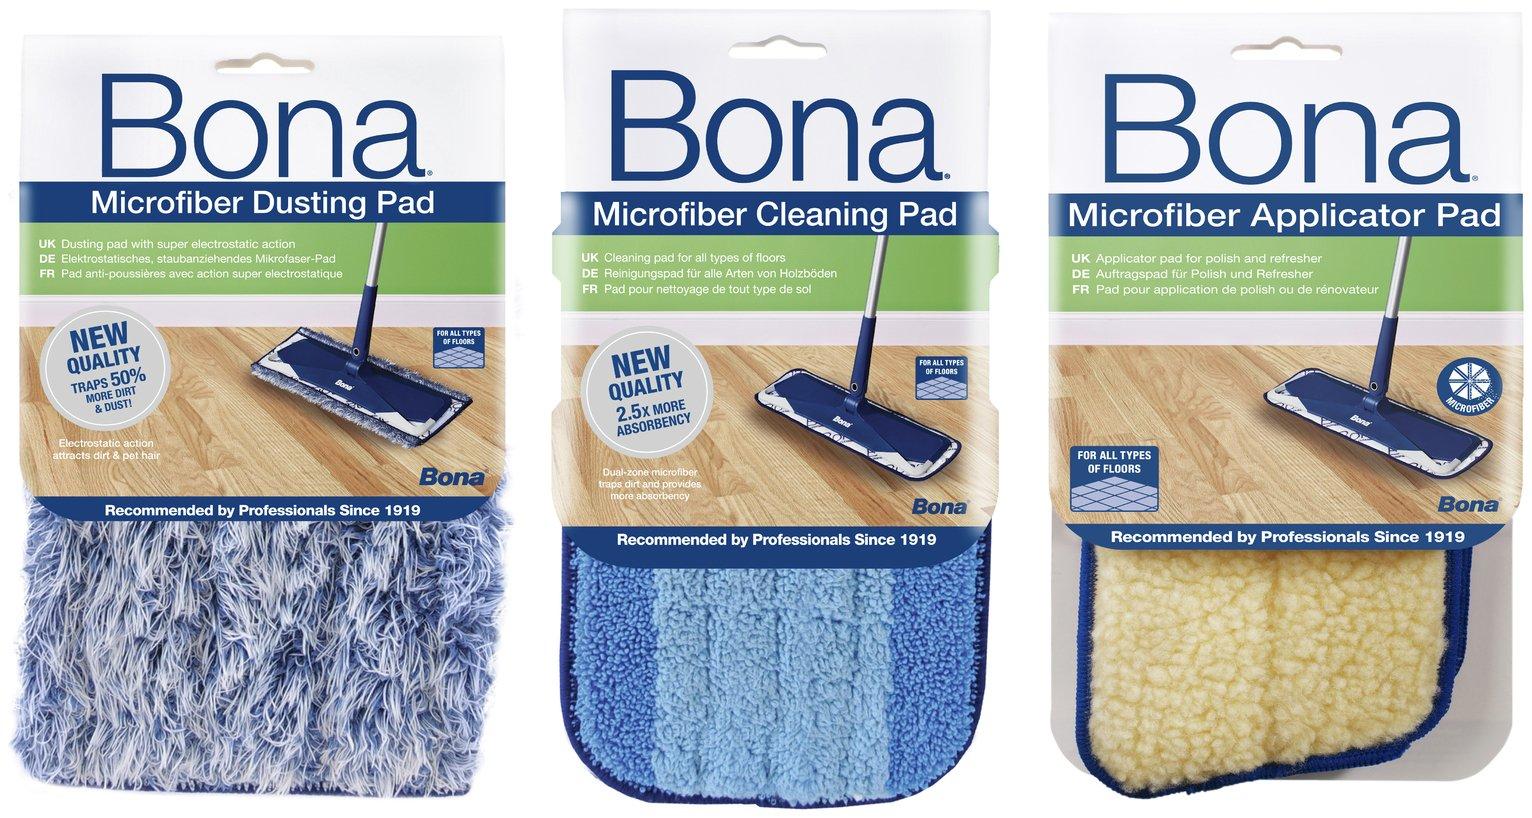 Bona Set of 3 Cleaning and Polishing Pads